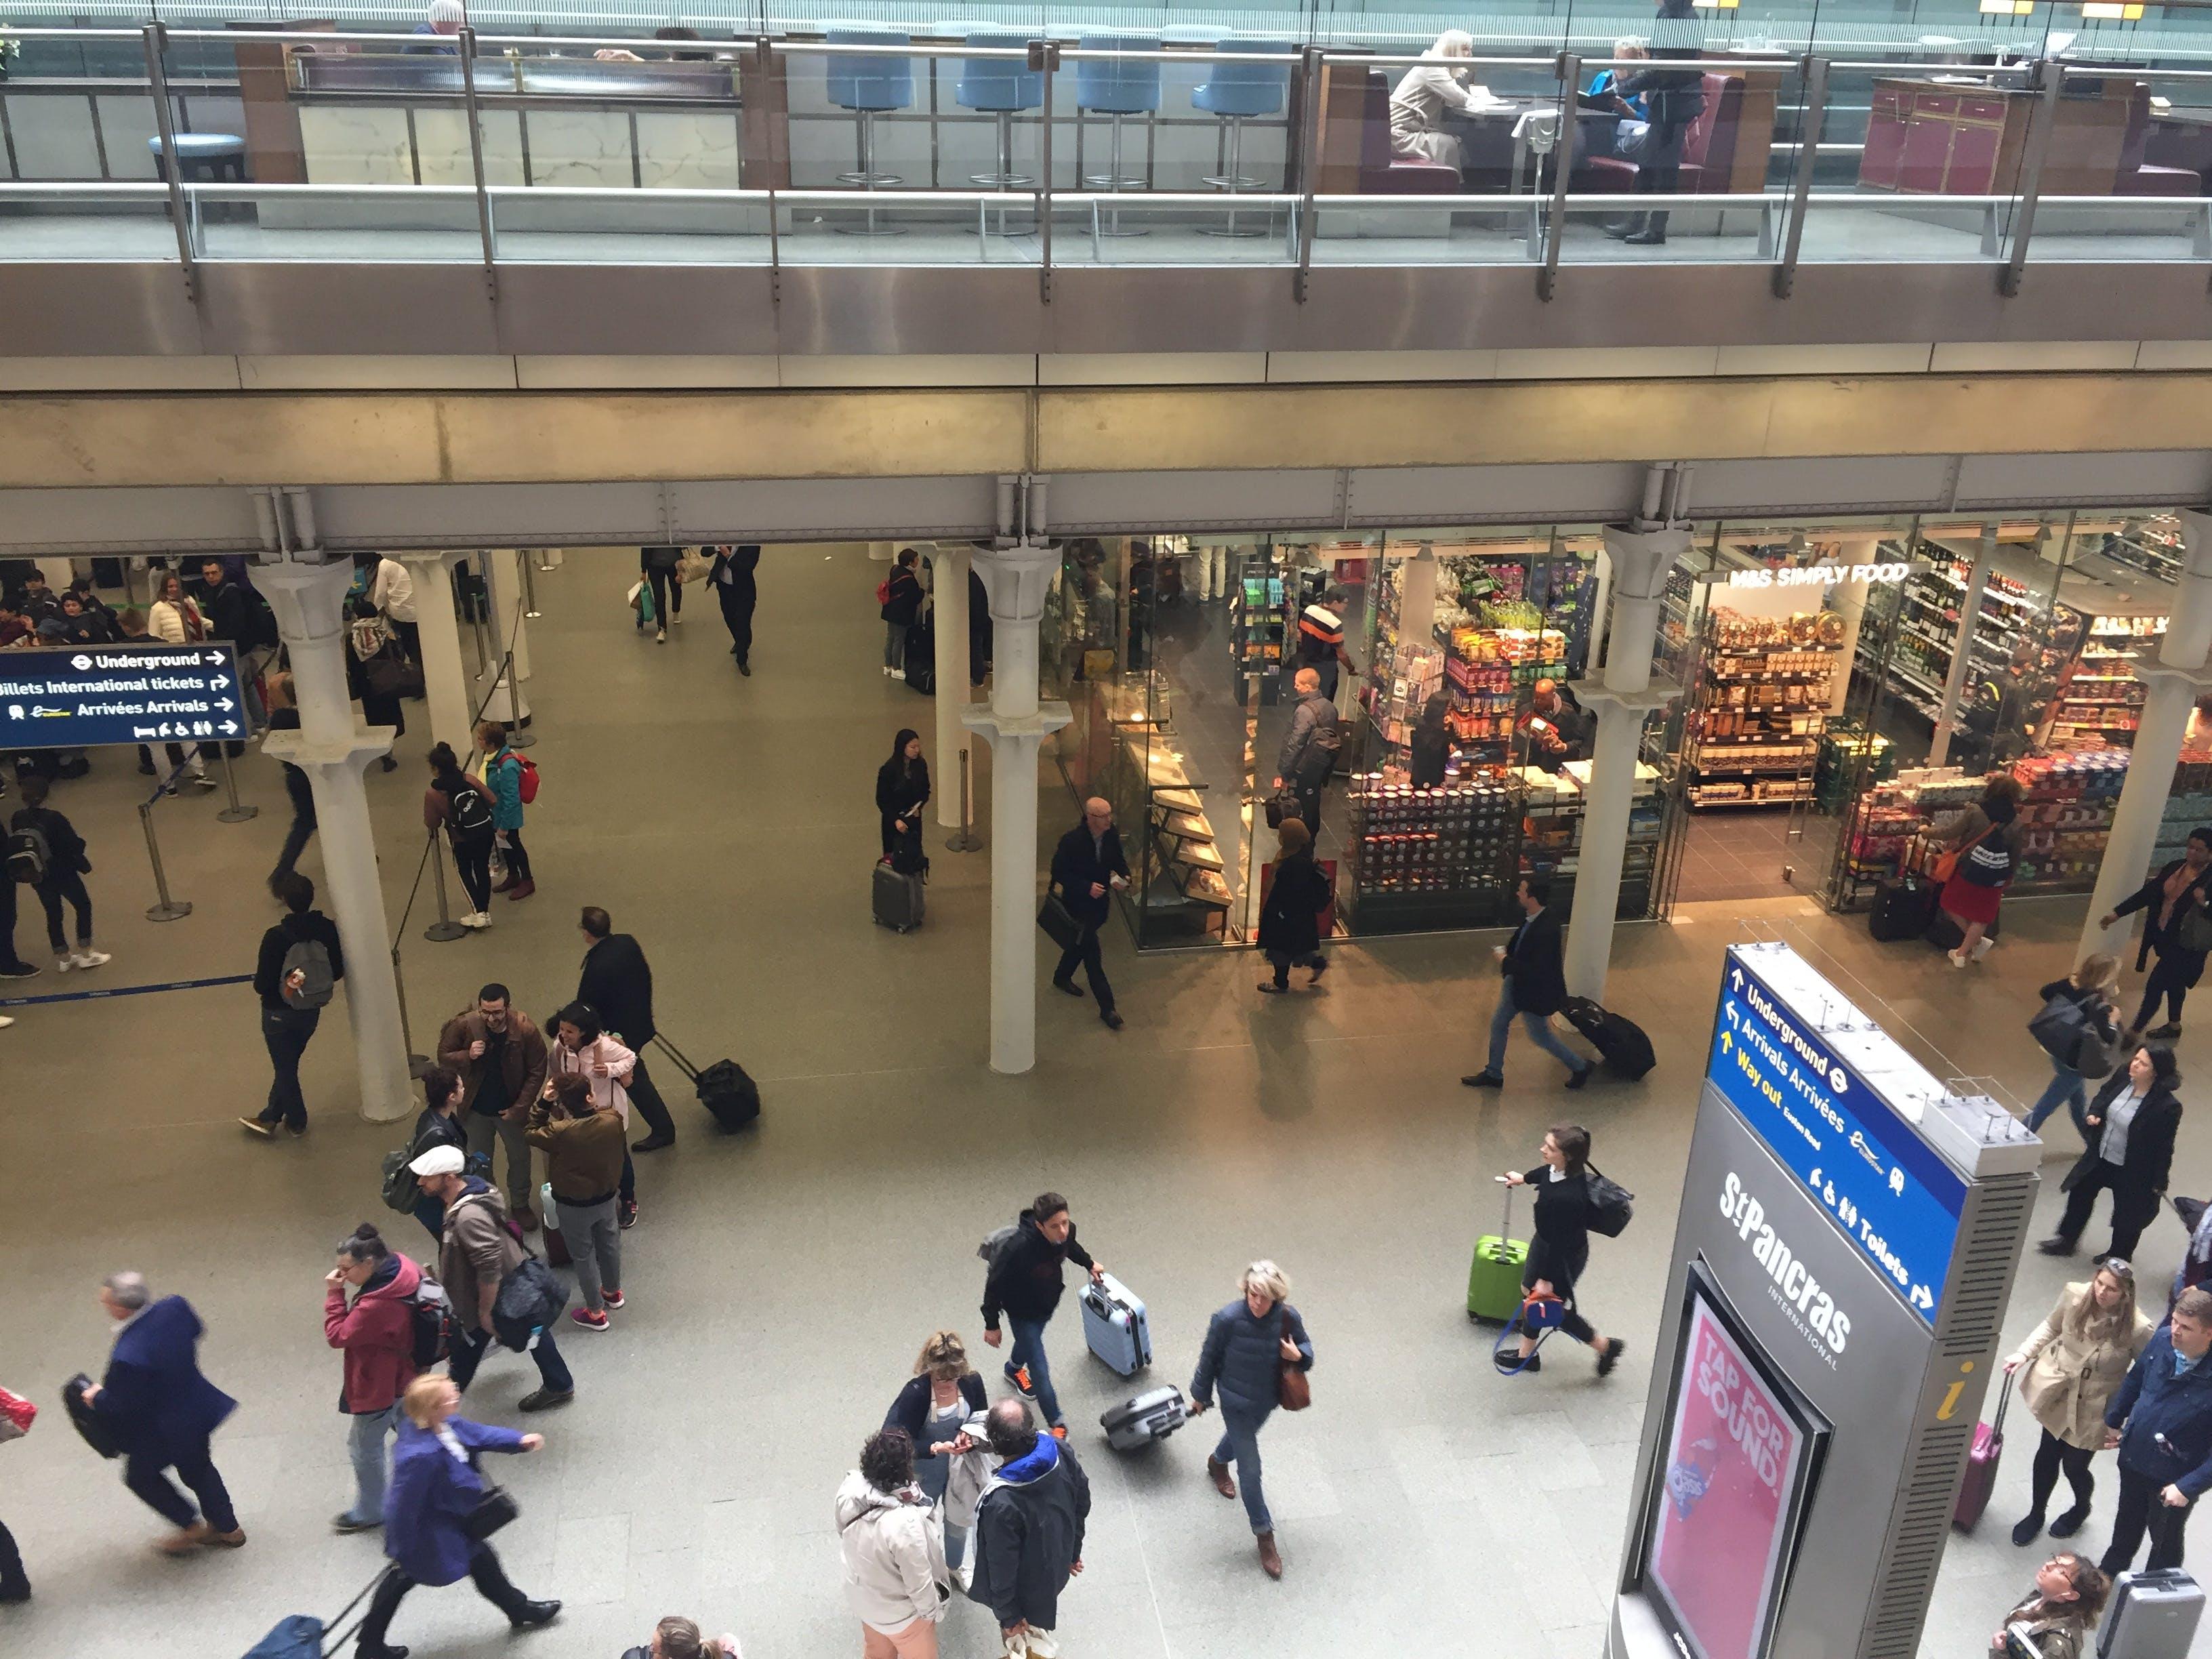 Free stock photo of Eurostar concourse, St Pancras International Station